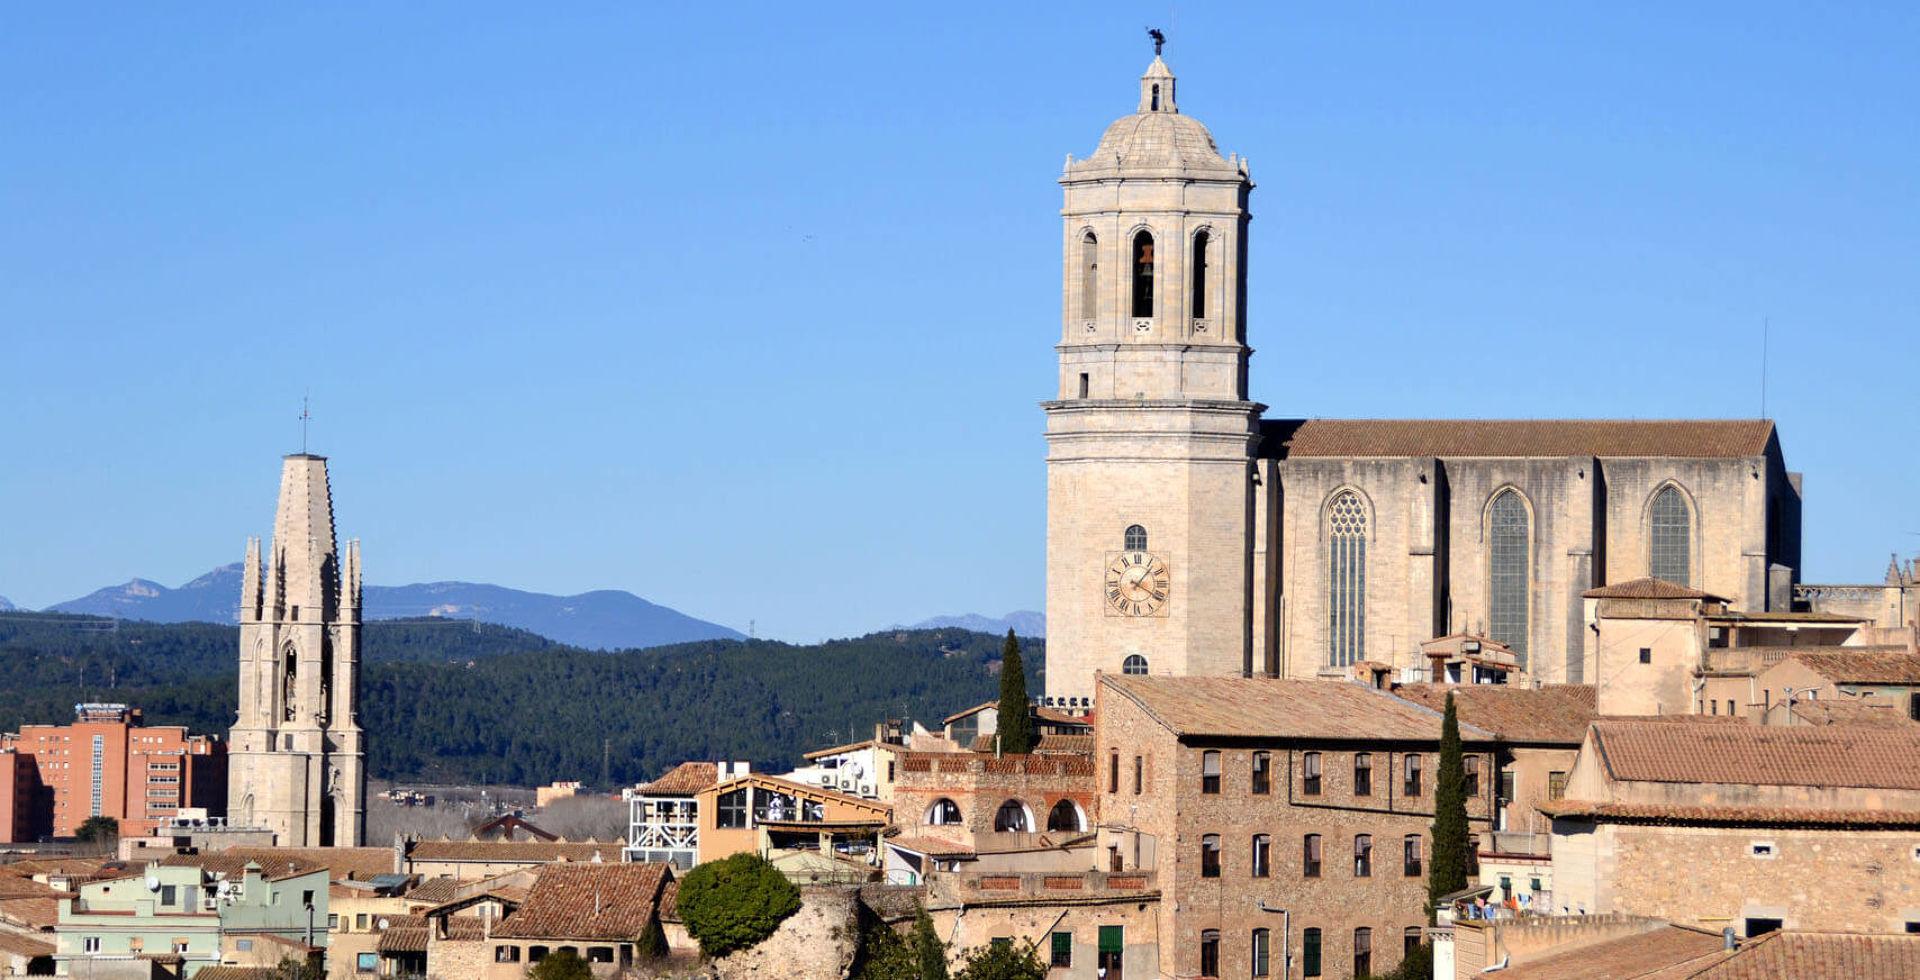 Girona monumental